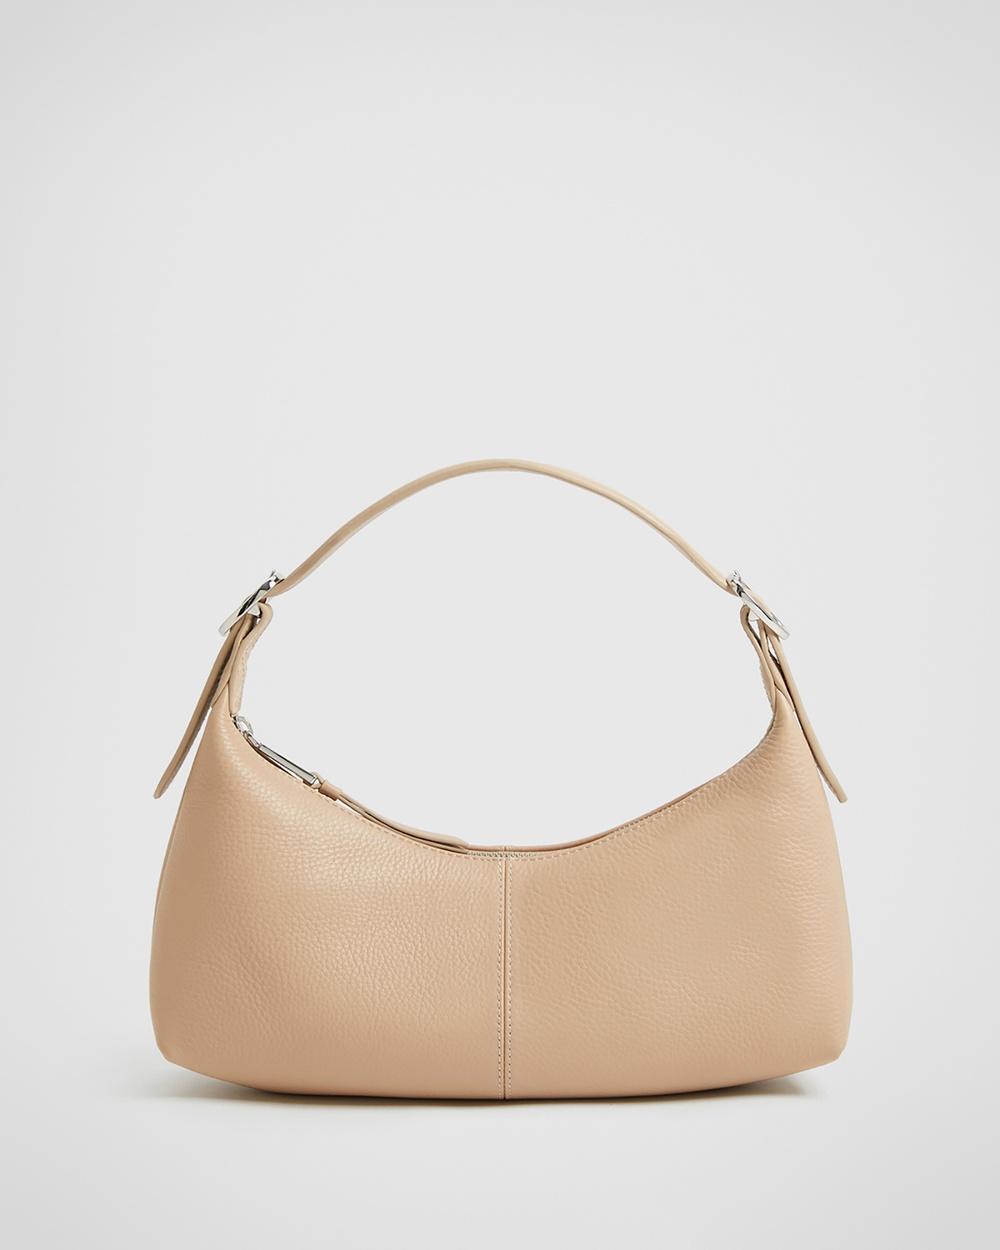 Witchery Zoe Pebble Shoulder Bag Bags neutrals Australia